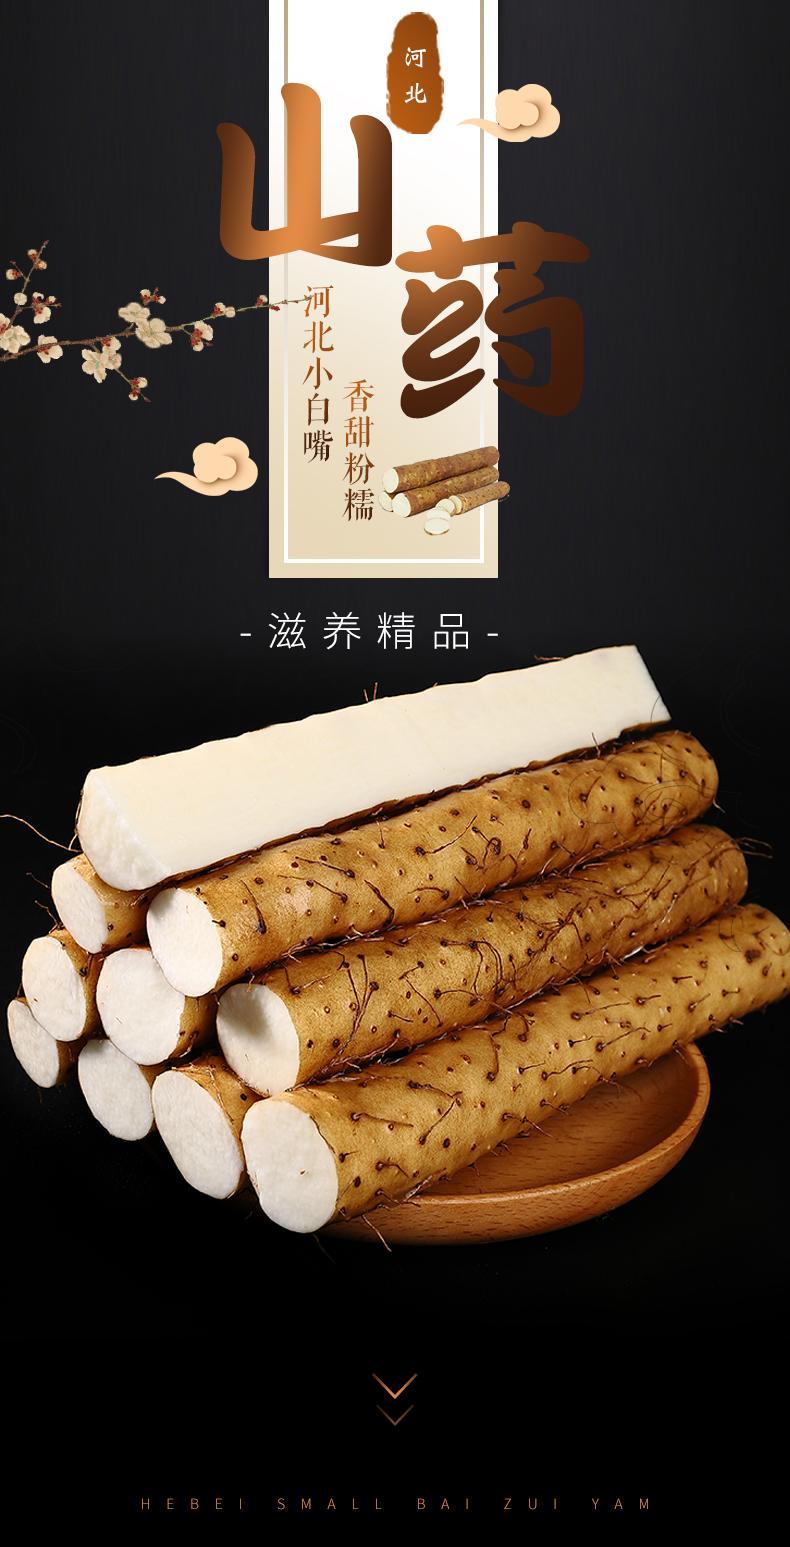 http://b2bwings-goods-image.oss-cn-shenzhen.aliyuncs.com/ed8b67cc-b7e8-49a1-a14c-cdcc4f1545eb.jpg